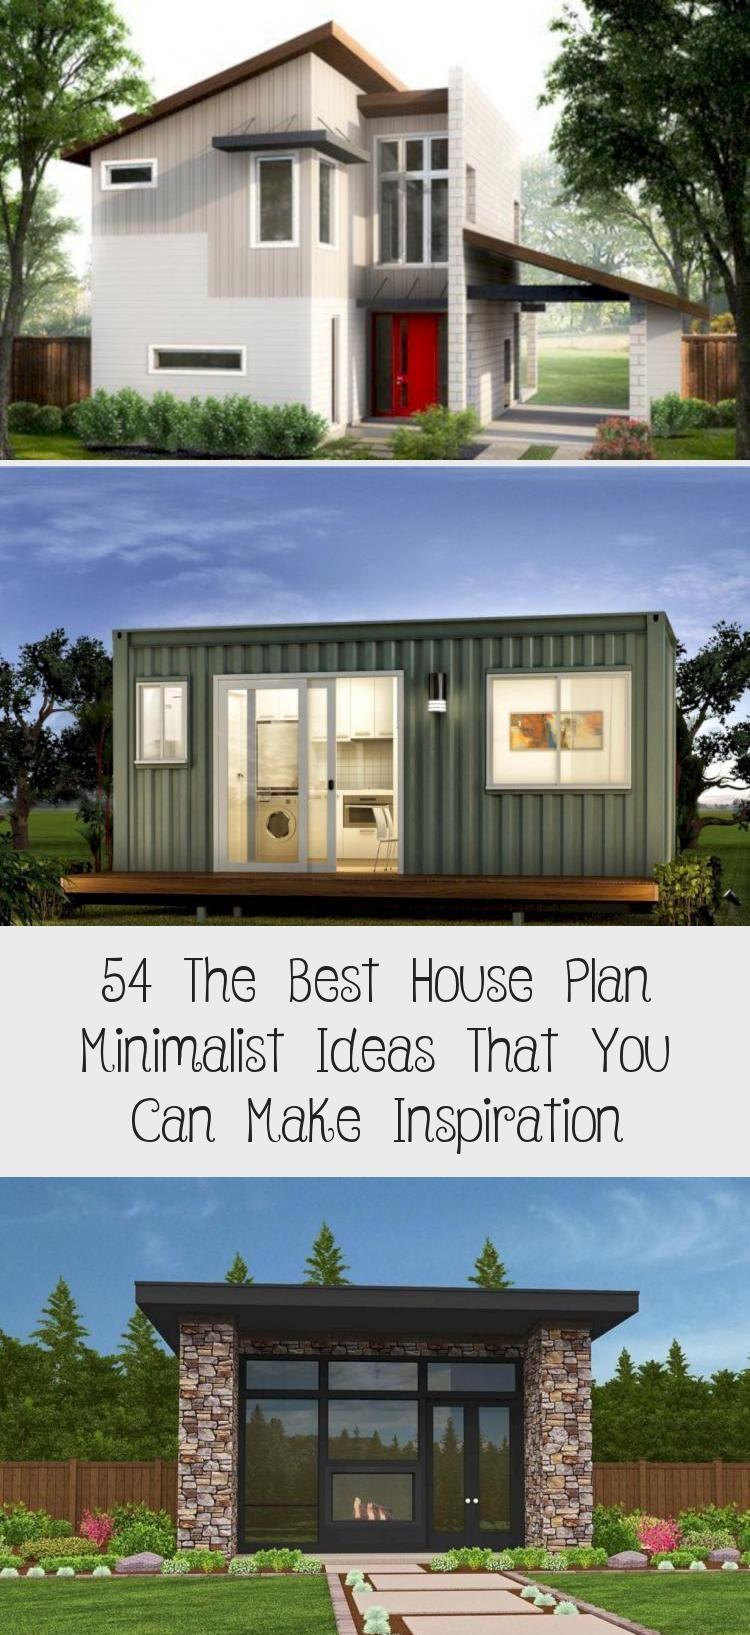 En Blog En Blog In 2020 Best House Plans House Plans Good House